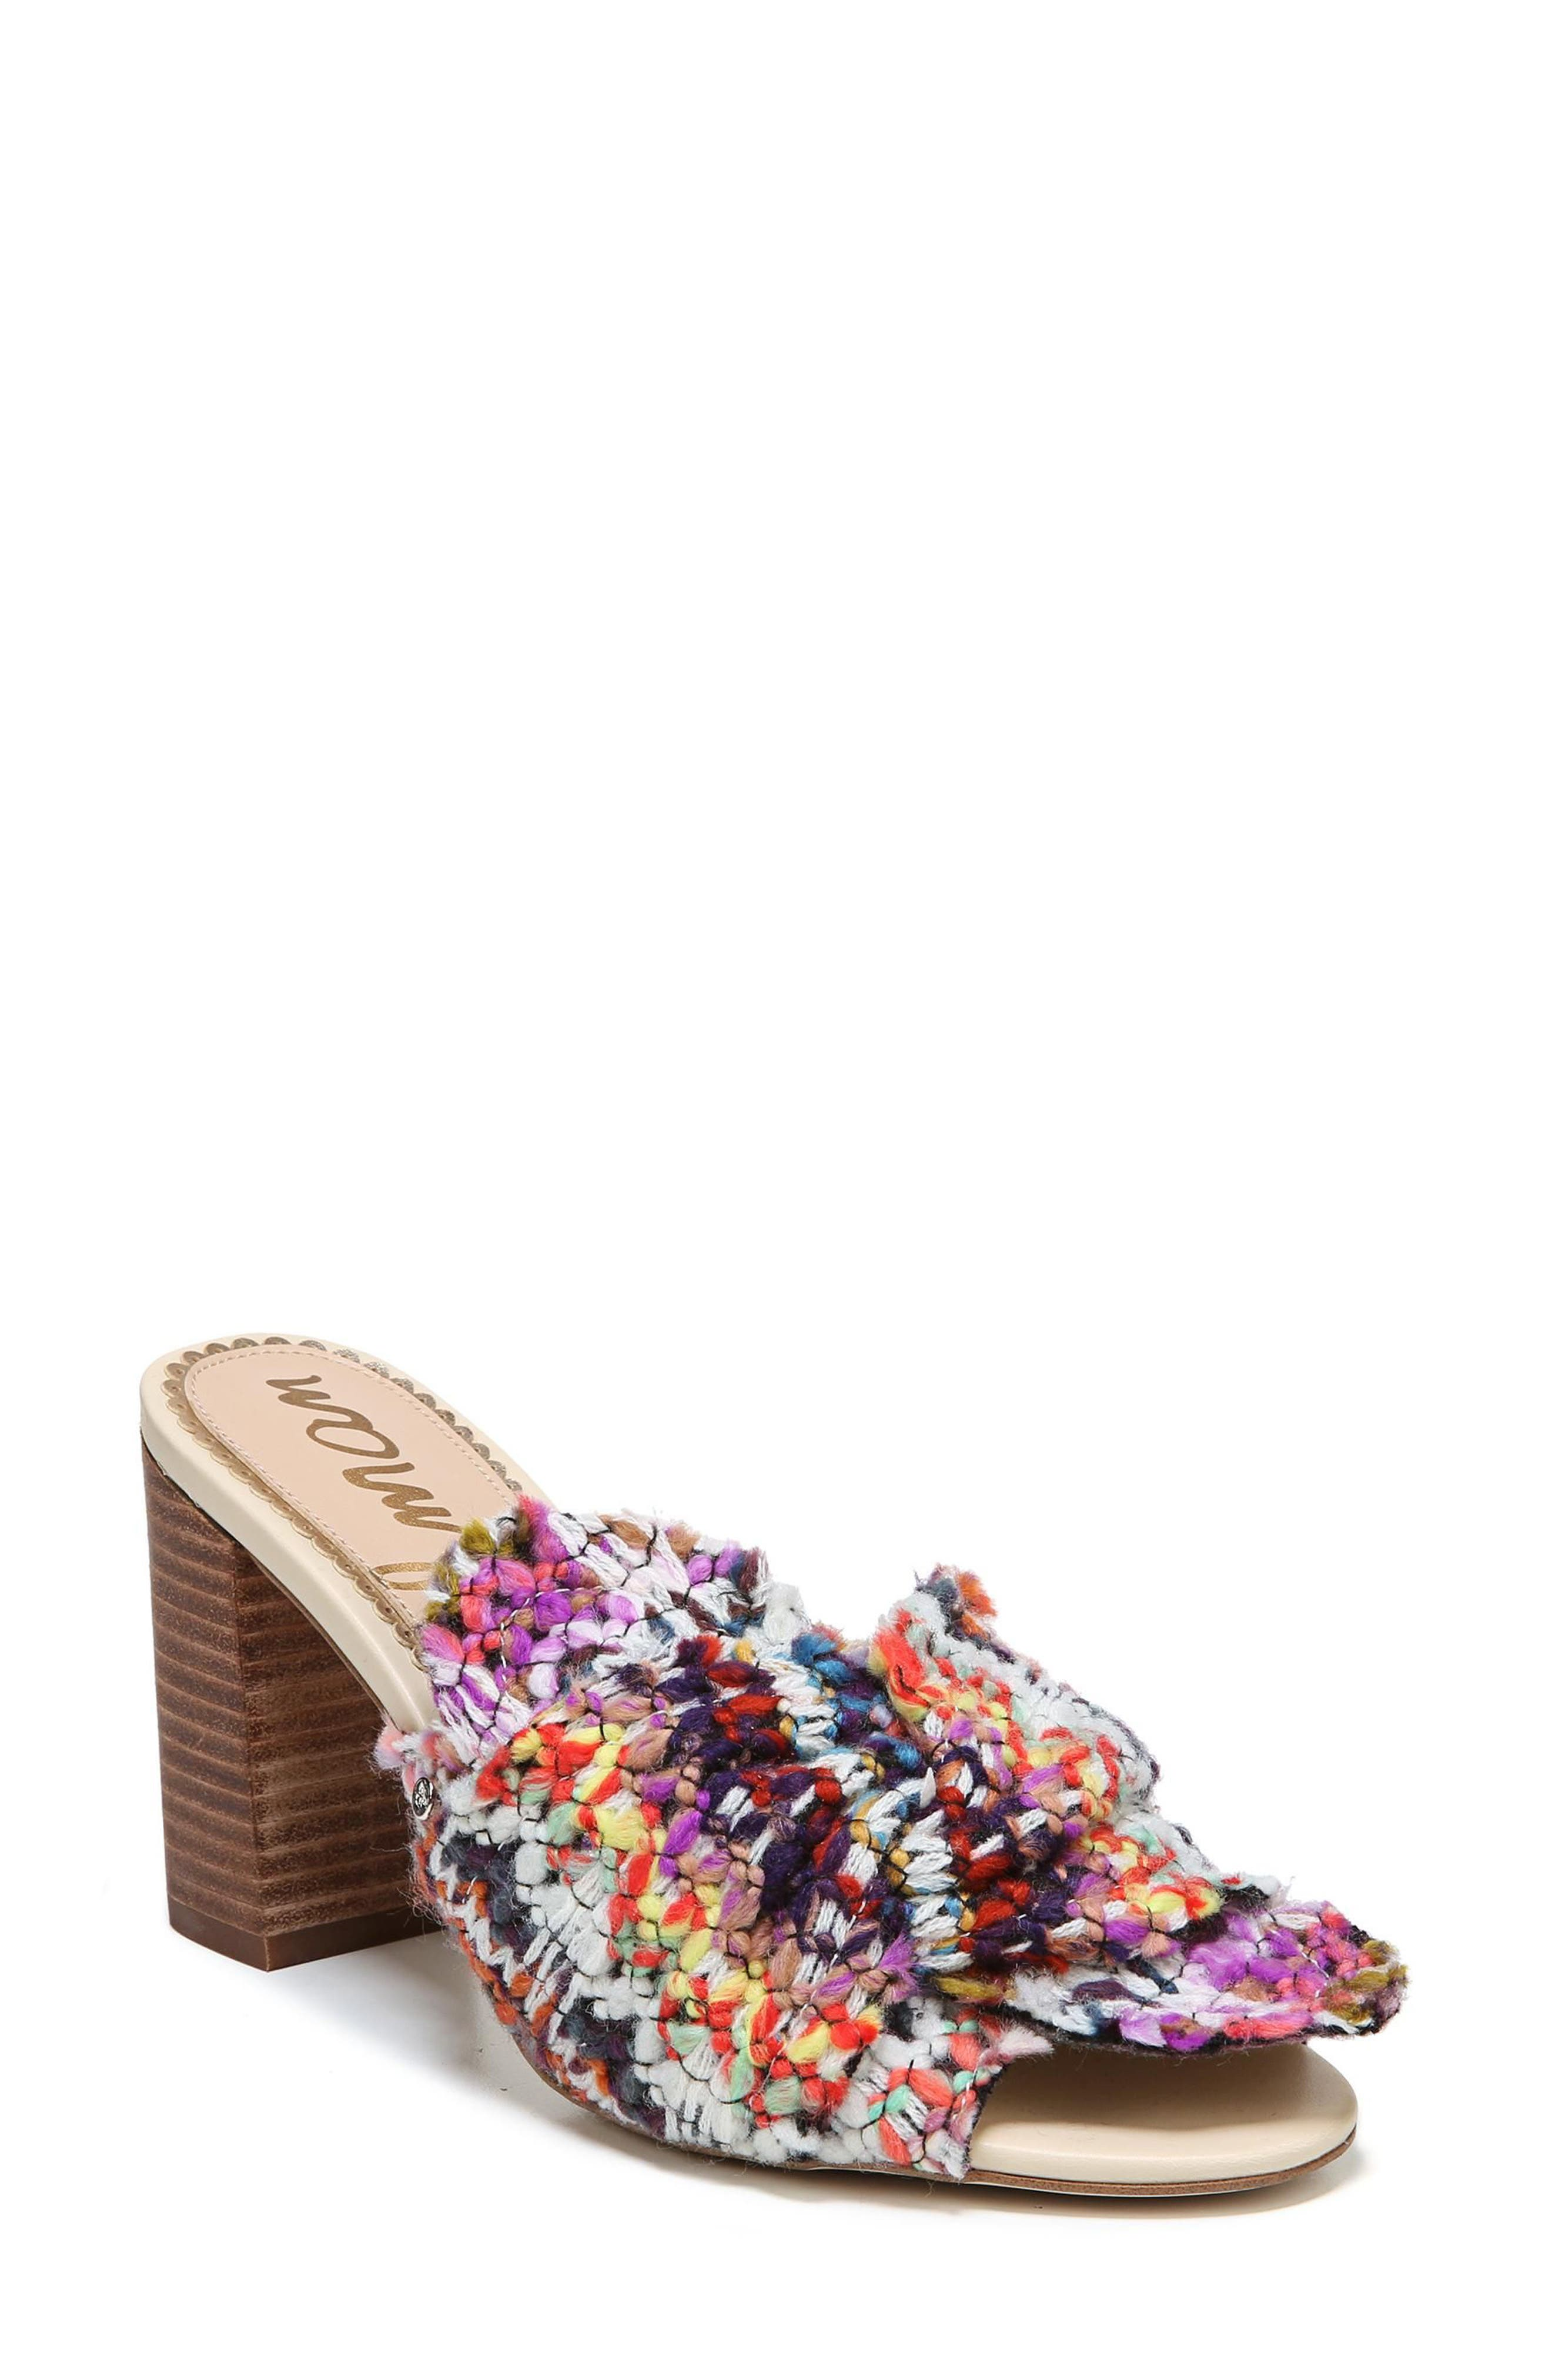 SAM EDELMAN Oda Slide Sandal, Main, color, 100